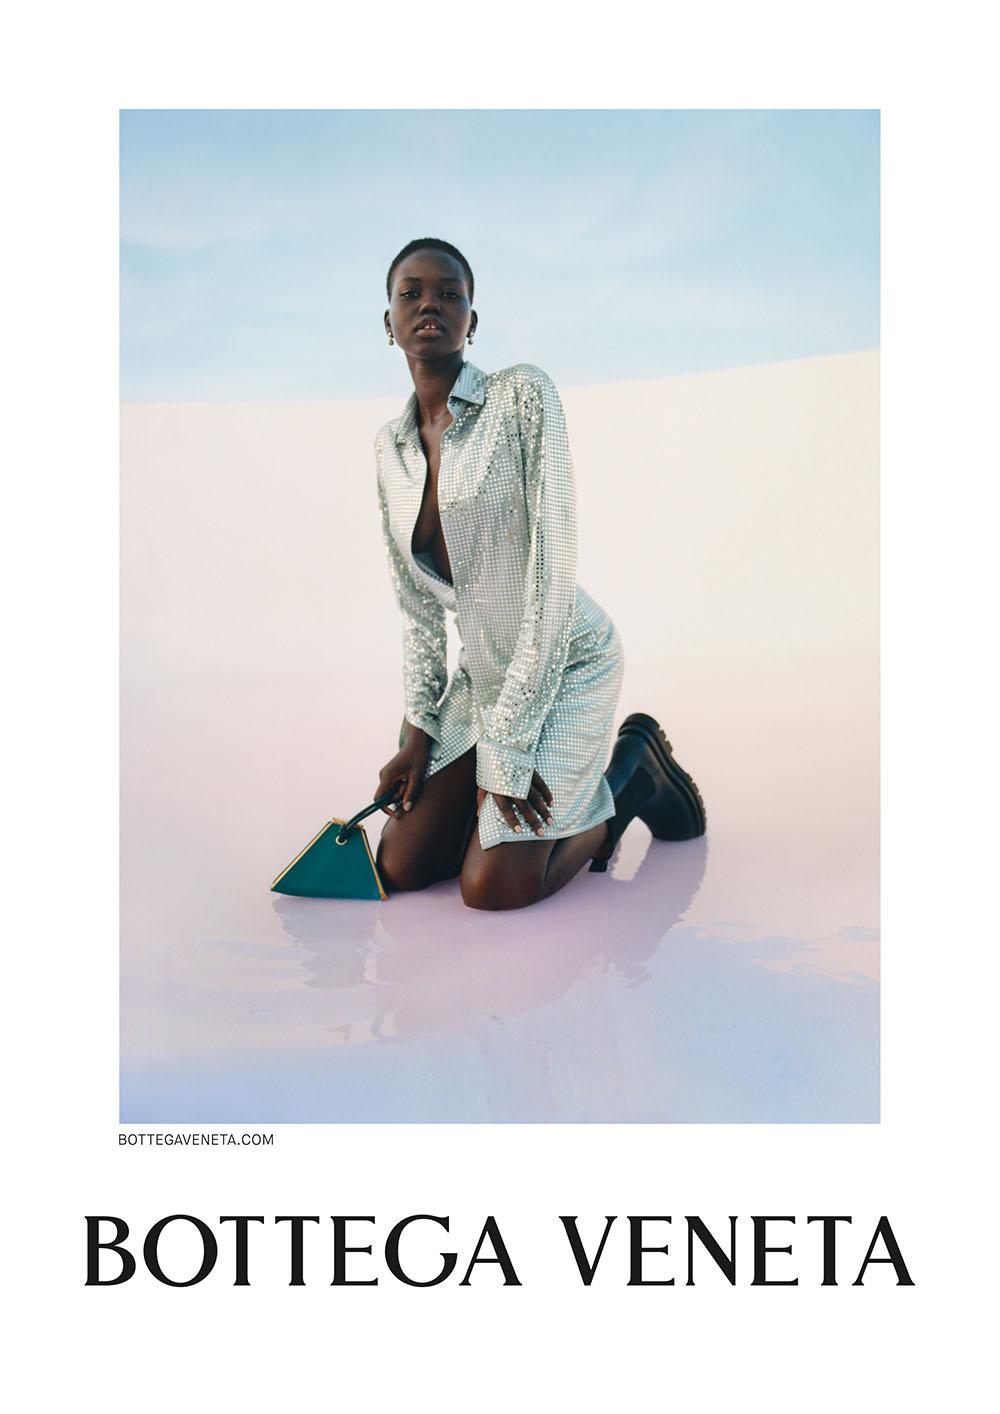 Bottega-Veneta-Fall-Winter-2019-Campaign-5.jpg